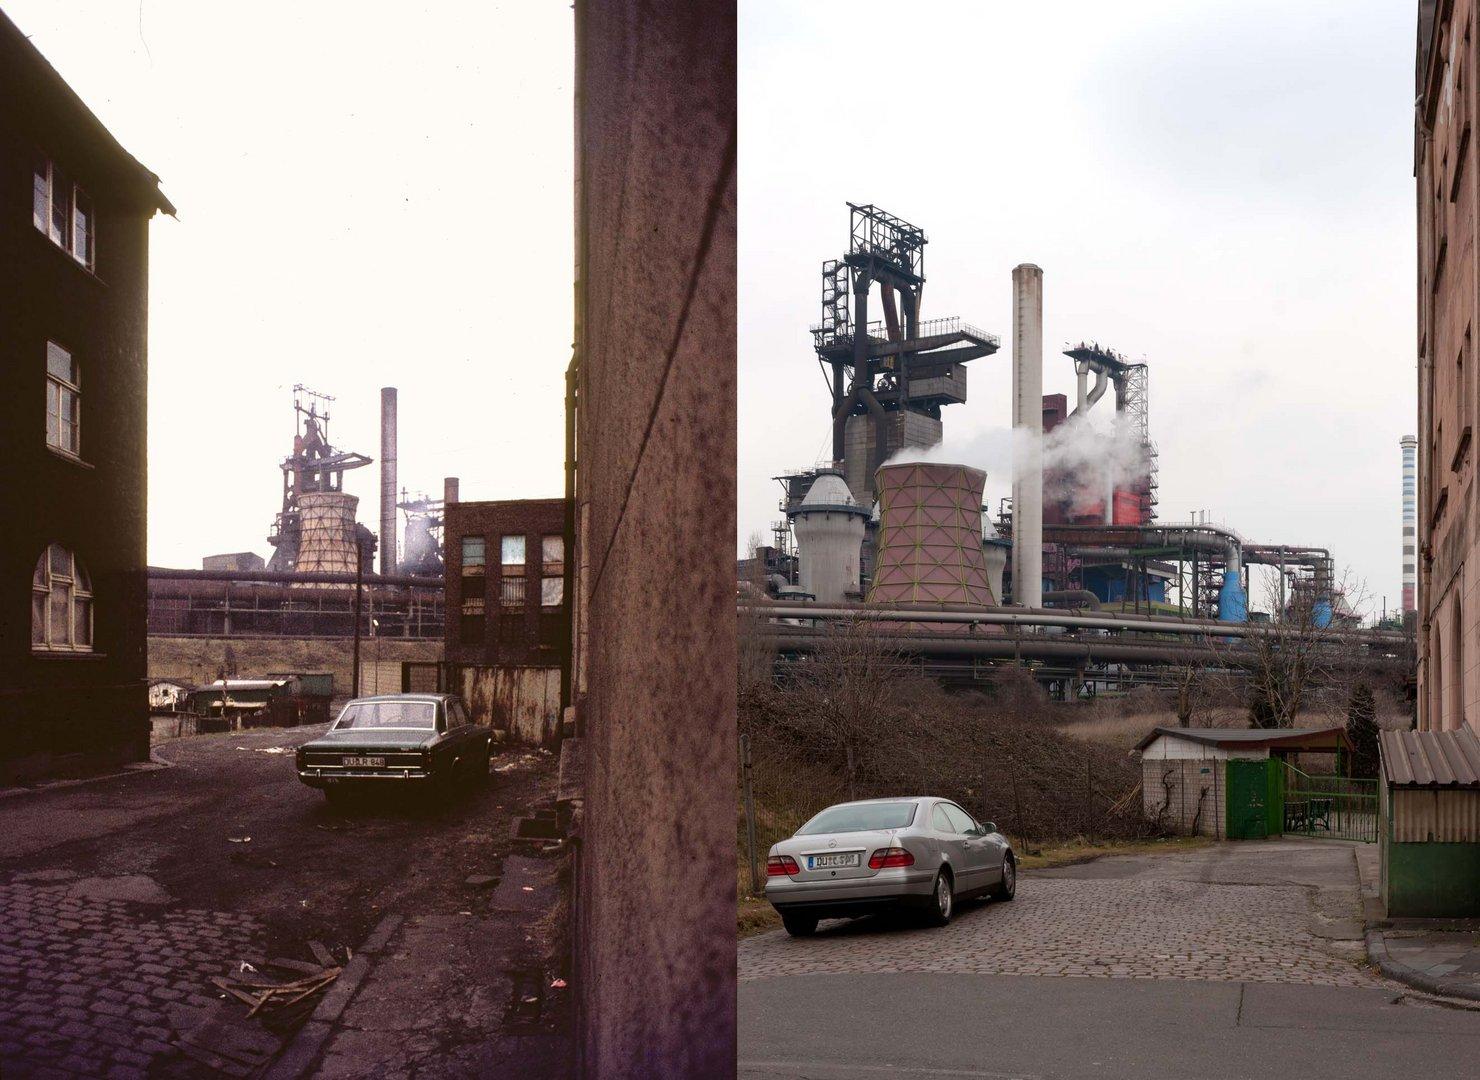 Zeitreise - Duisburg Beeck, Hubertusstr. 1979 & 2012